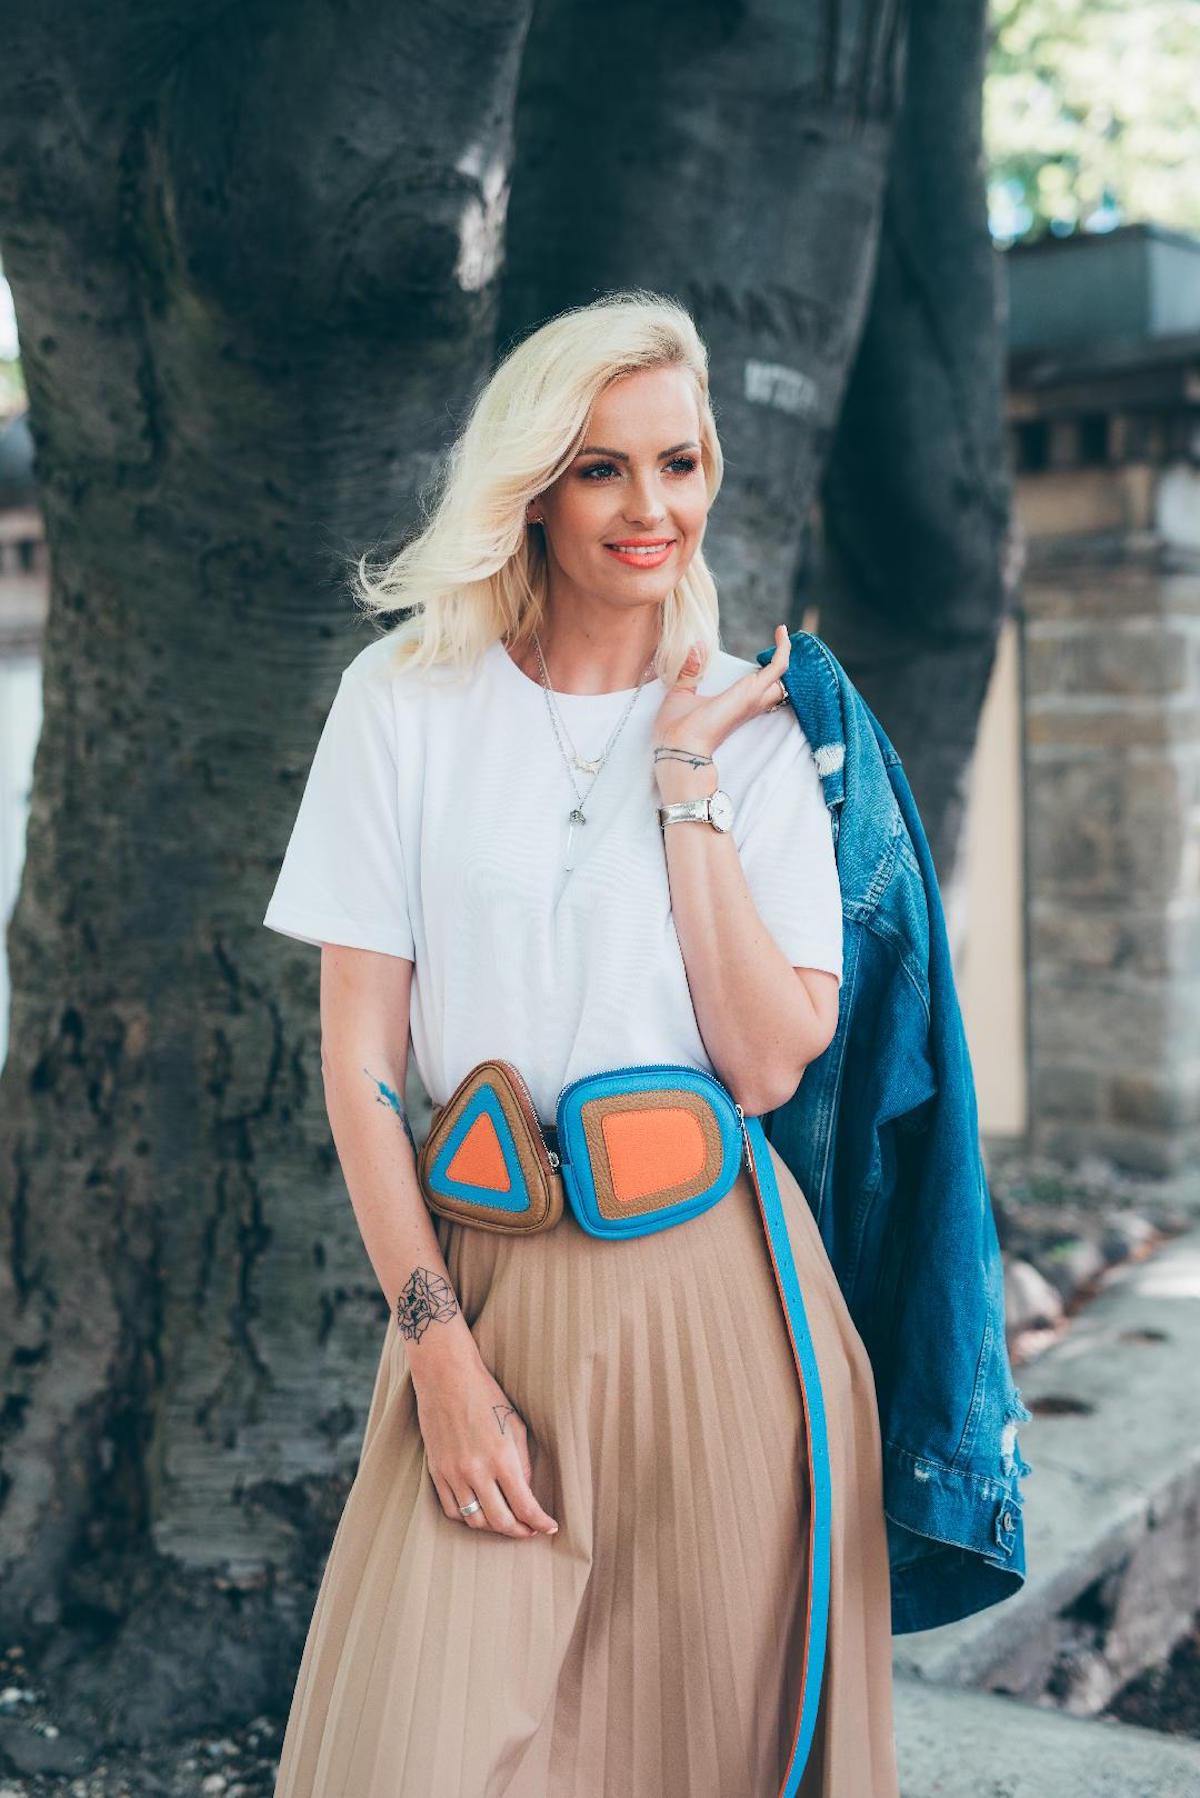 tjasa kokalj koralna trajnostna moda torbica yugoslovanka beautyfull blog